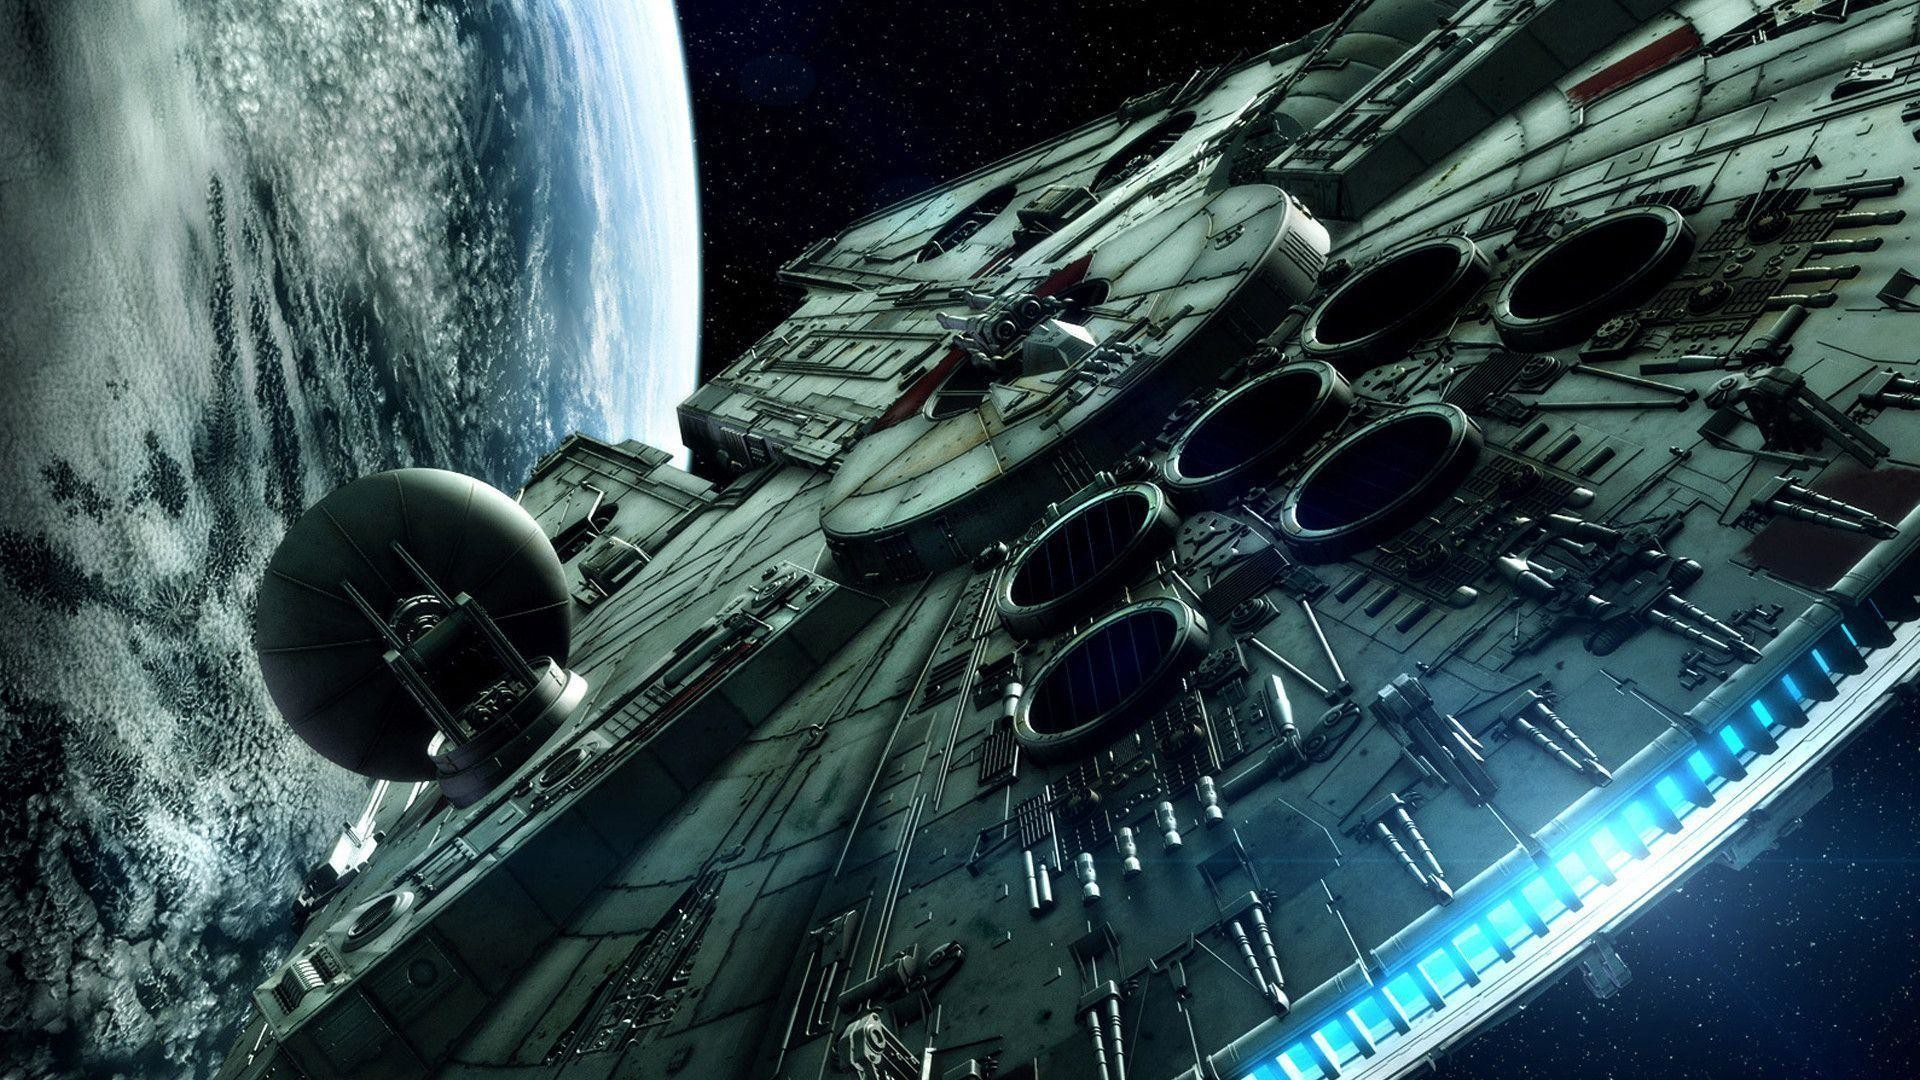 Star Wars Wallpaper Widescreen 70 Images